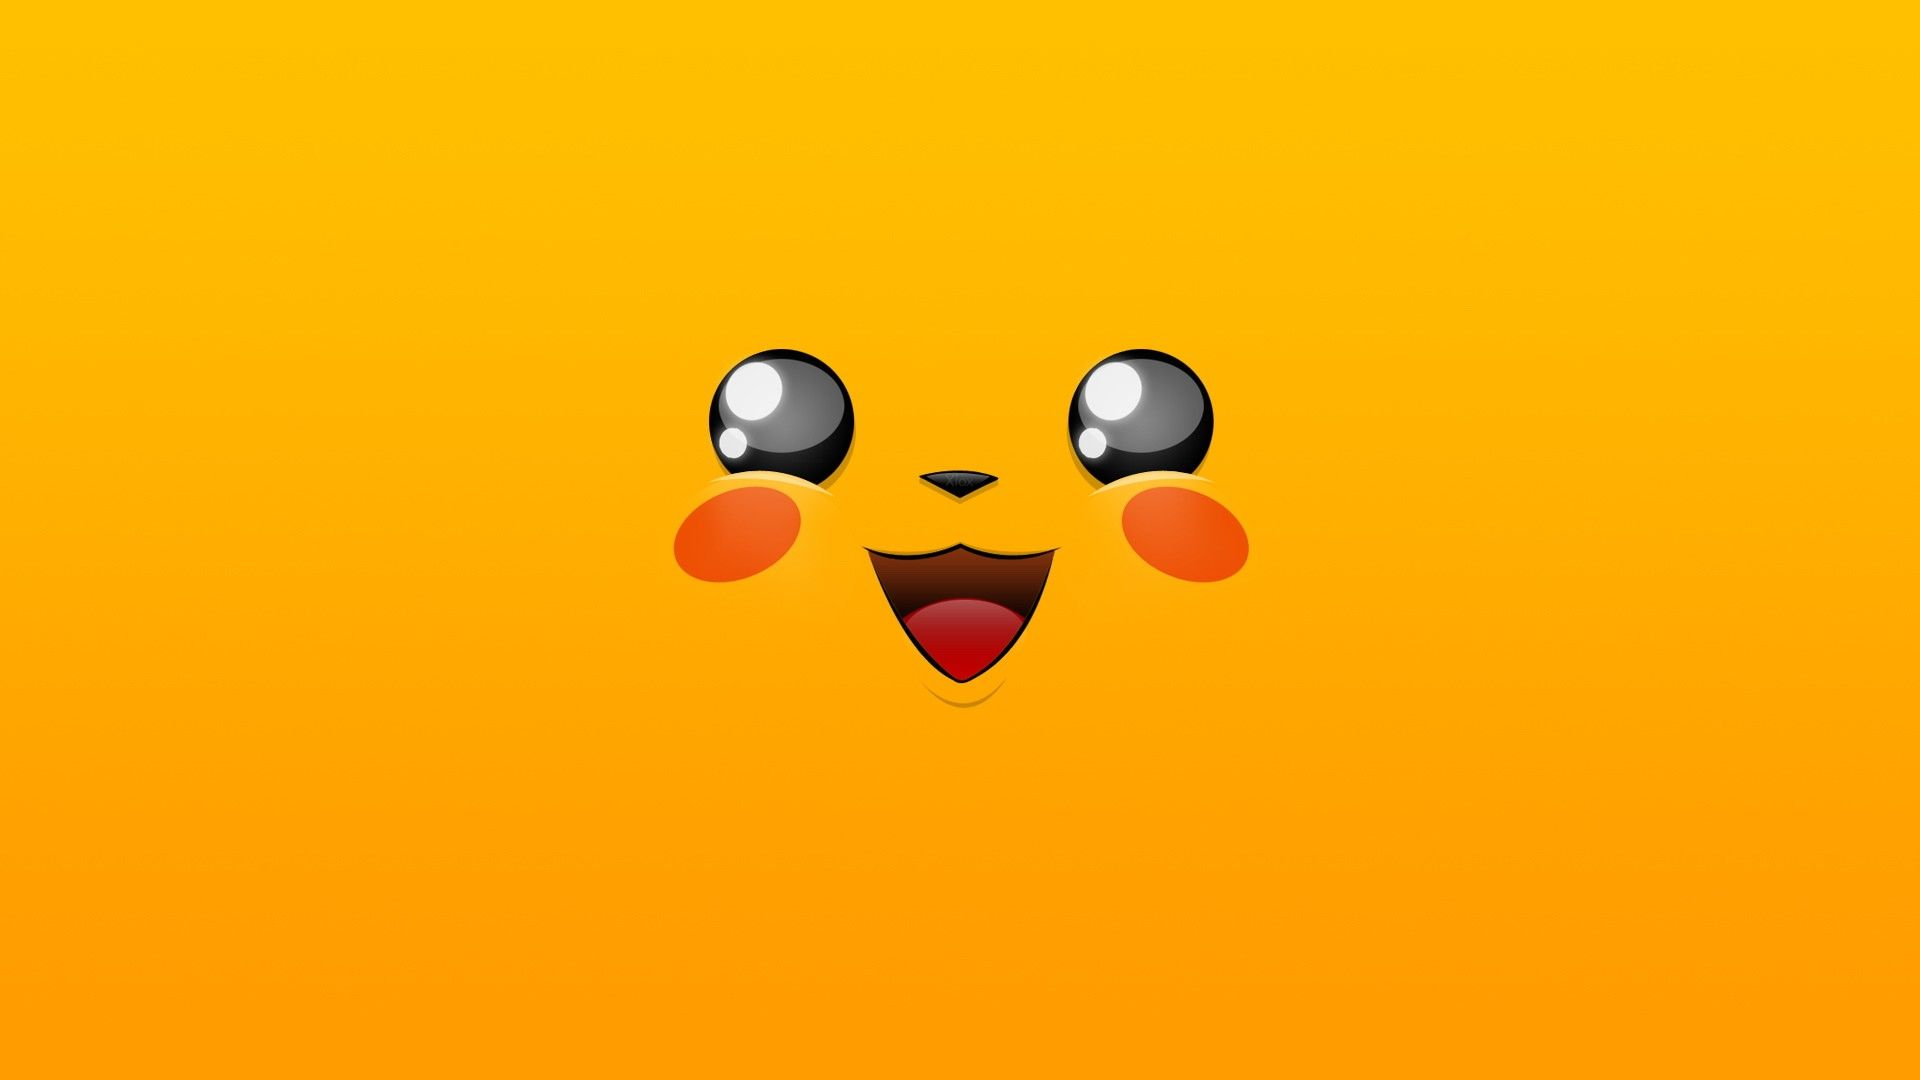 Download Pikachu Wallpaper 4353 1920x1080 px High